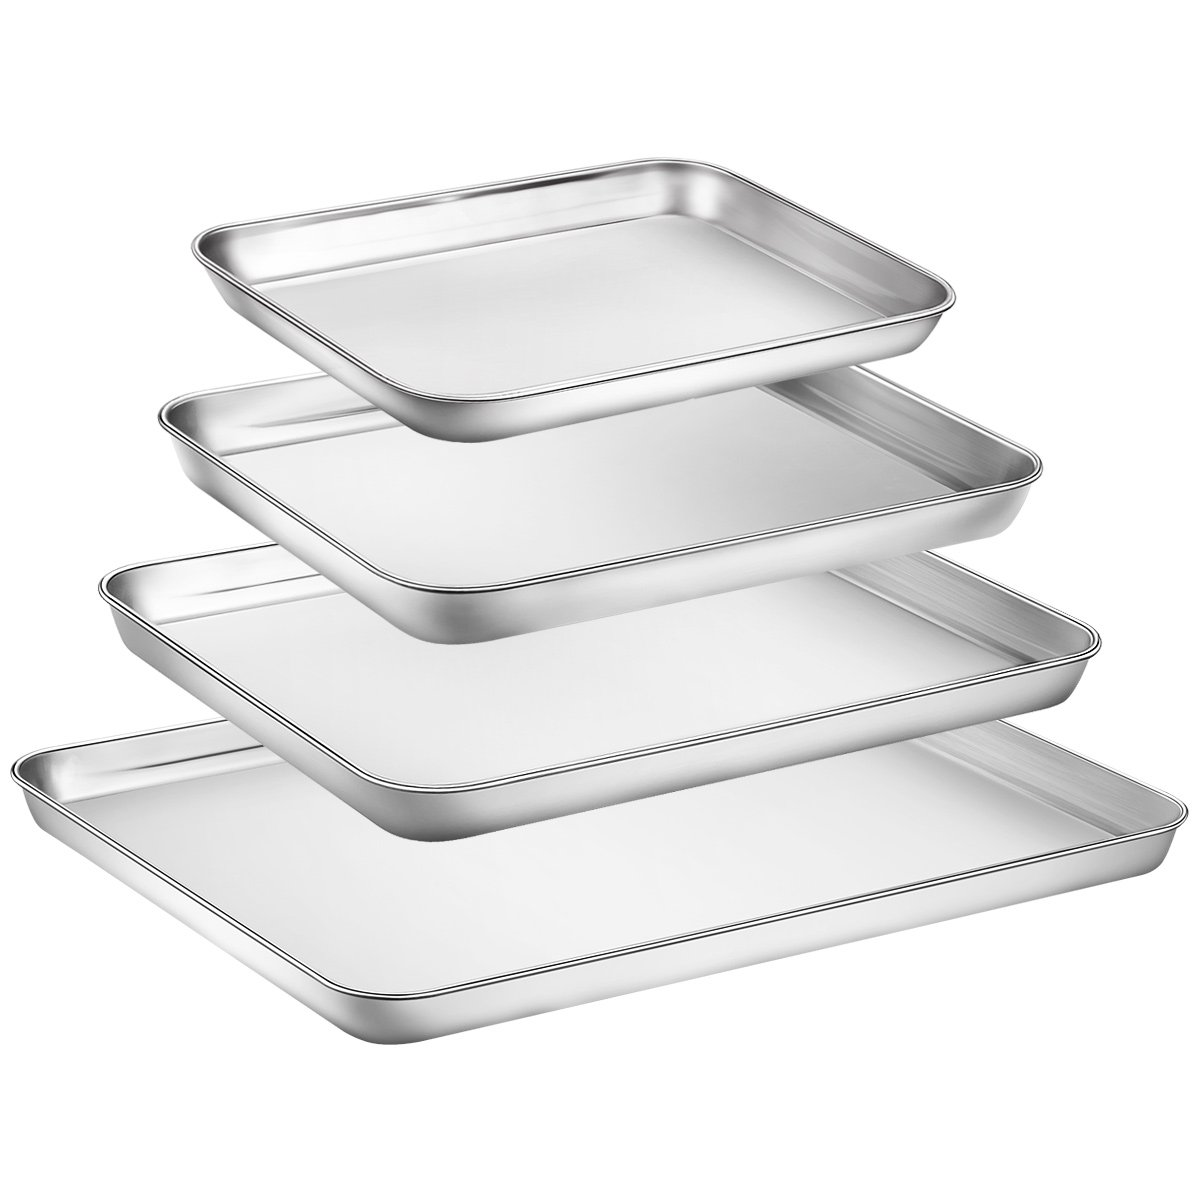 Zacfton Baking Sheet Set of 4, Stainless Steel Baking Pan Tray Cookie Sheet, Non Toxic & Healthy, Rust Free & Easy Clean & Dishwasher Safe